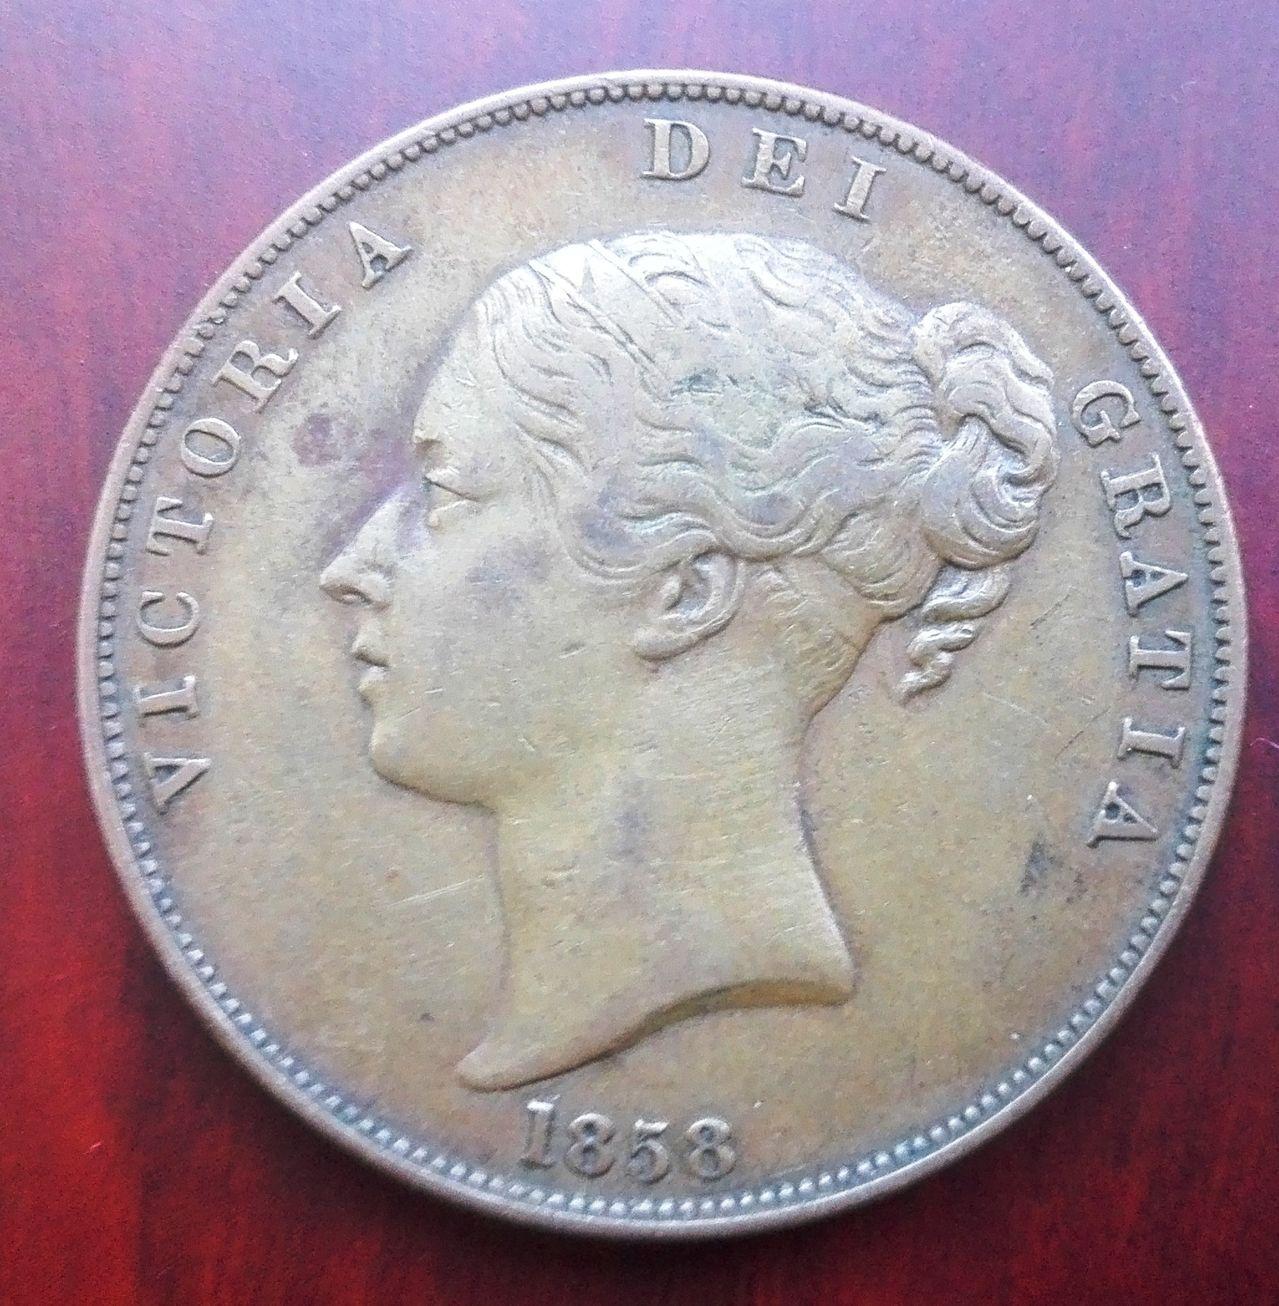 1 penique 1858, Gran Bretaña. Reina Victoria 1_penique_1858_anv